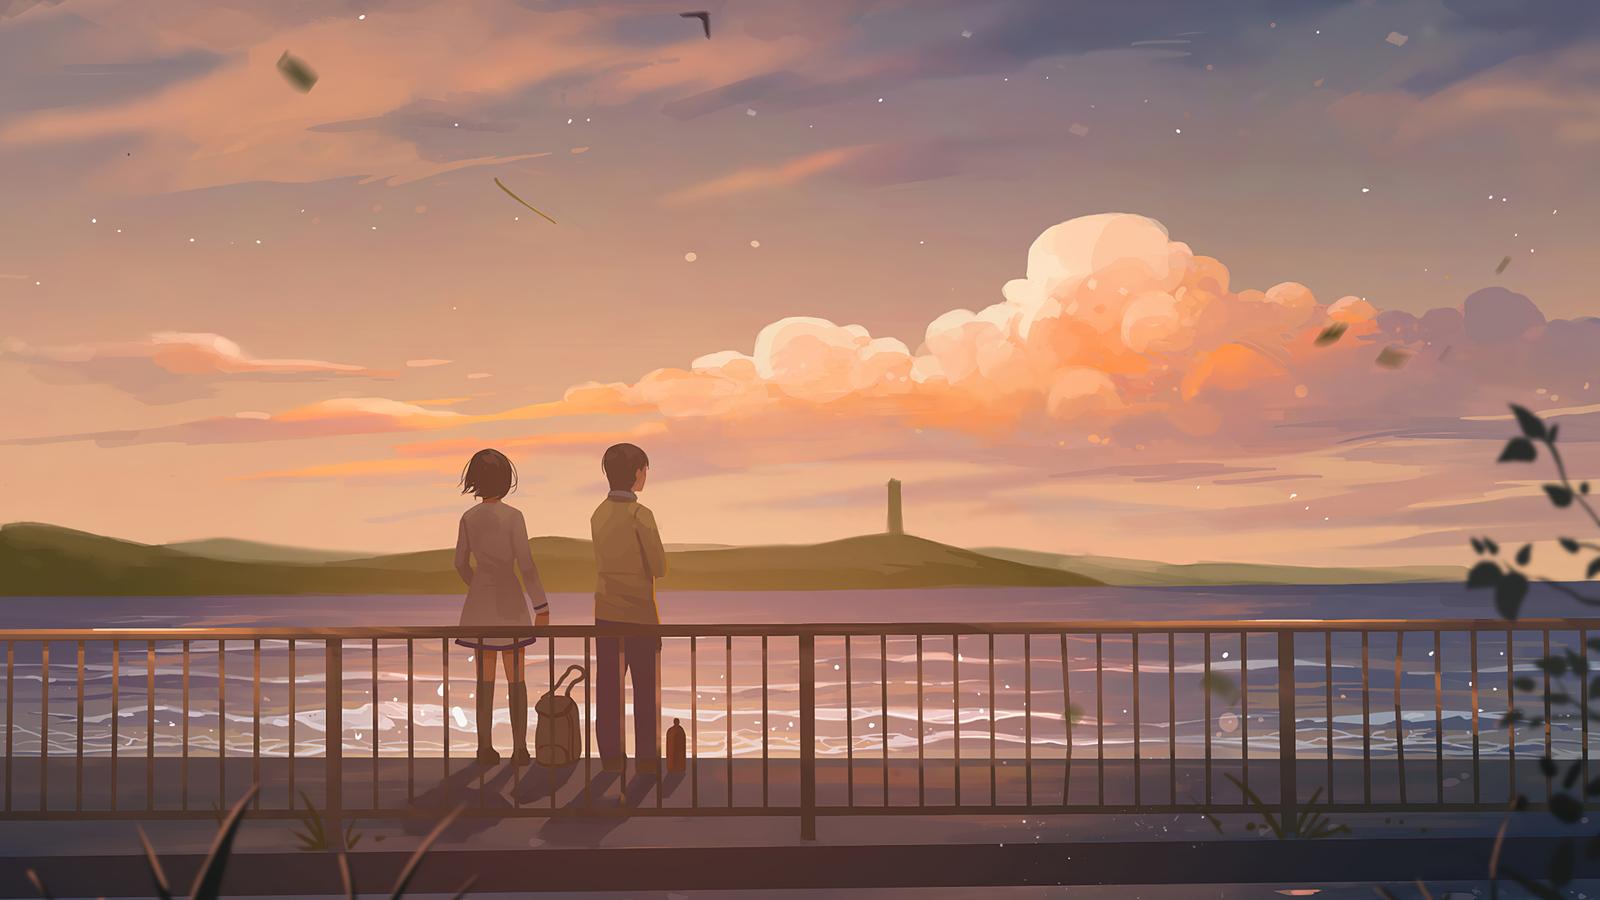 1600x900 Anime Couple Lets Talk 4k 1600x900 Resolution HD ...